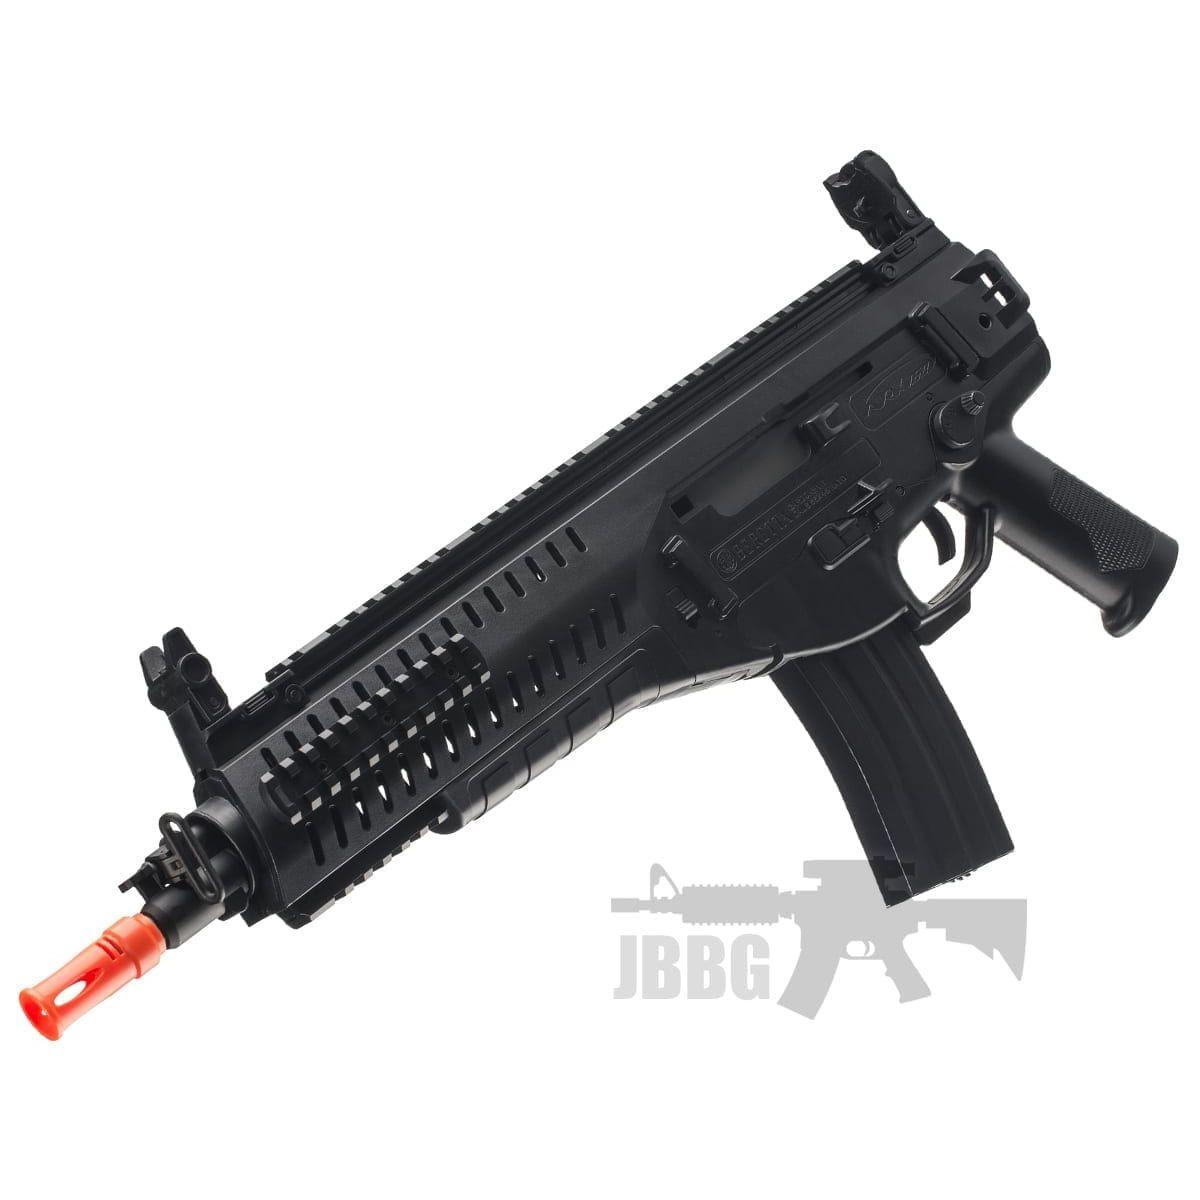 arx160 airsoft rifle